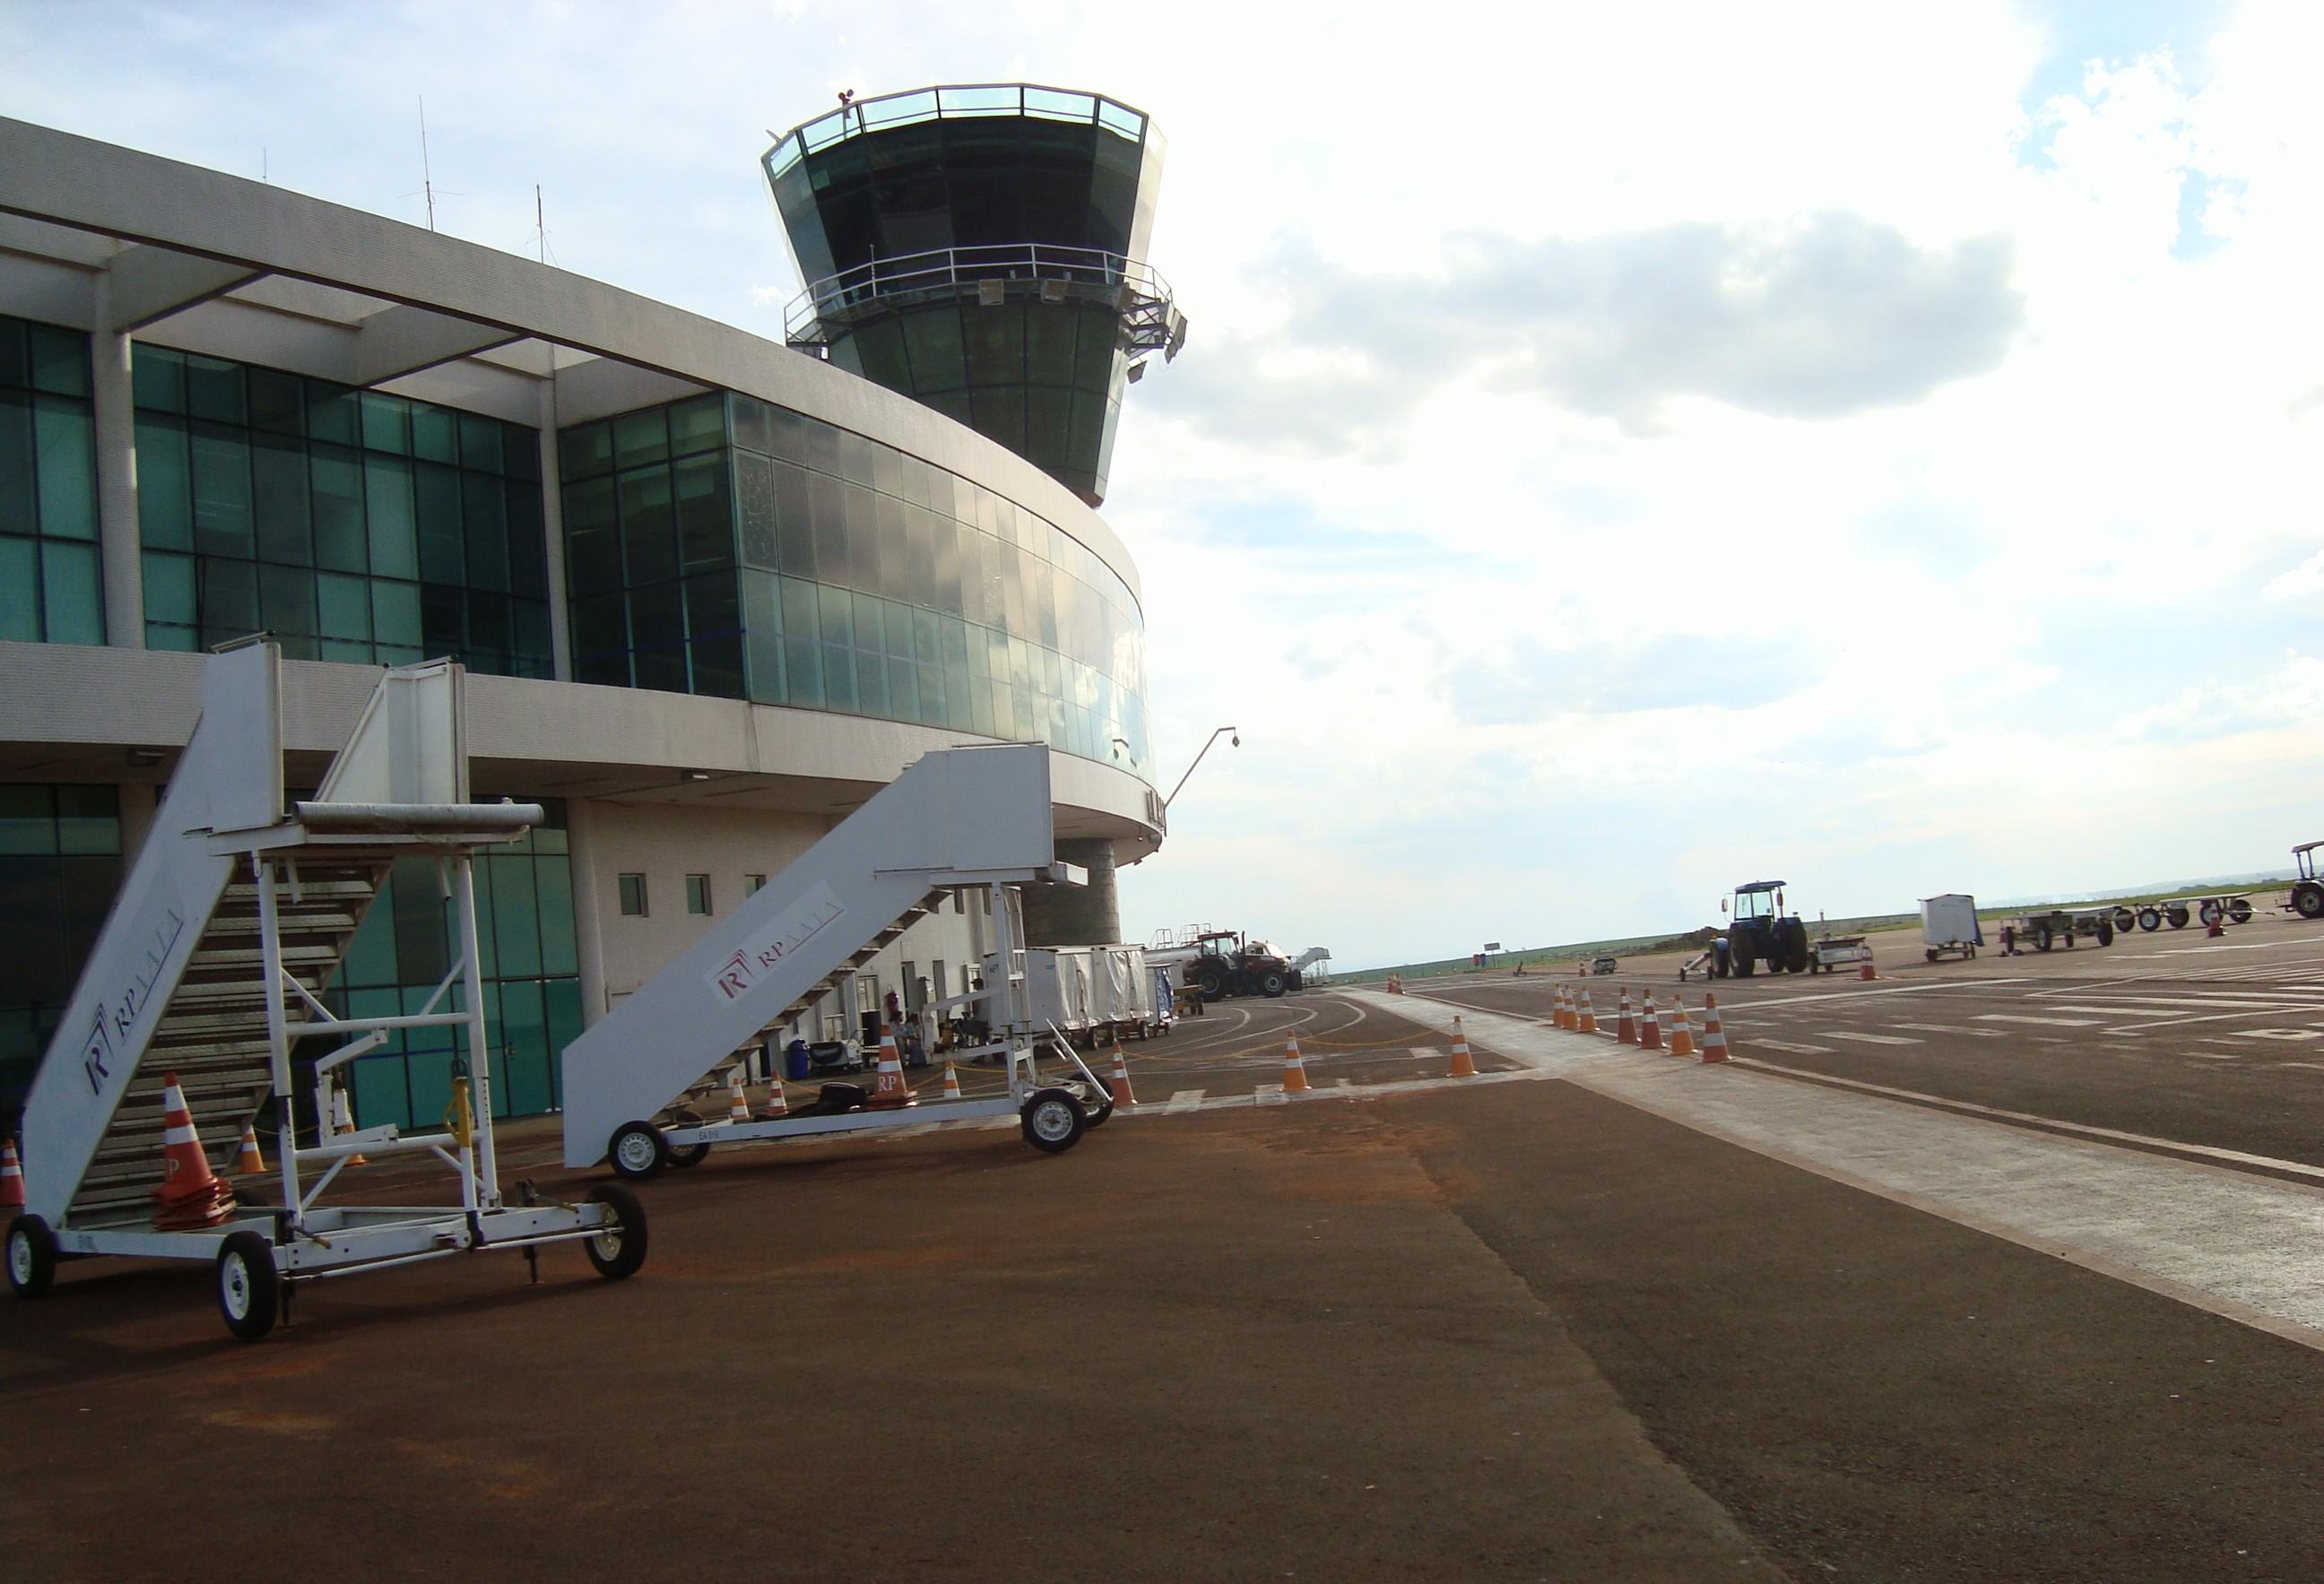 Superintendente nega risco de rebaixamento de categoria do aeroporto de Maringá